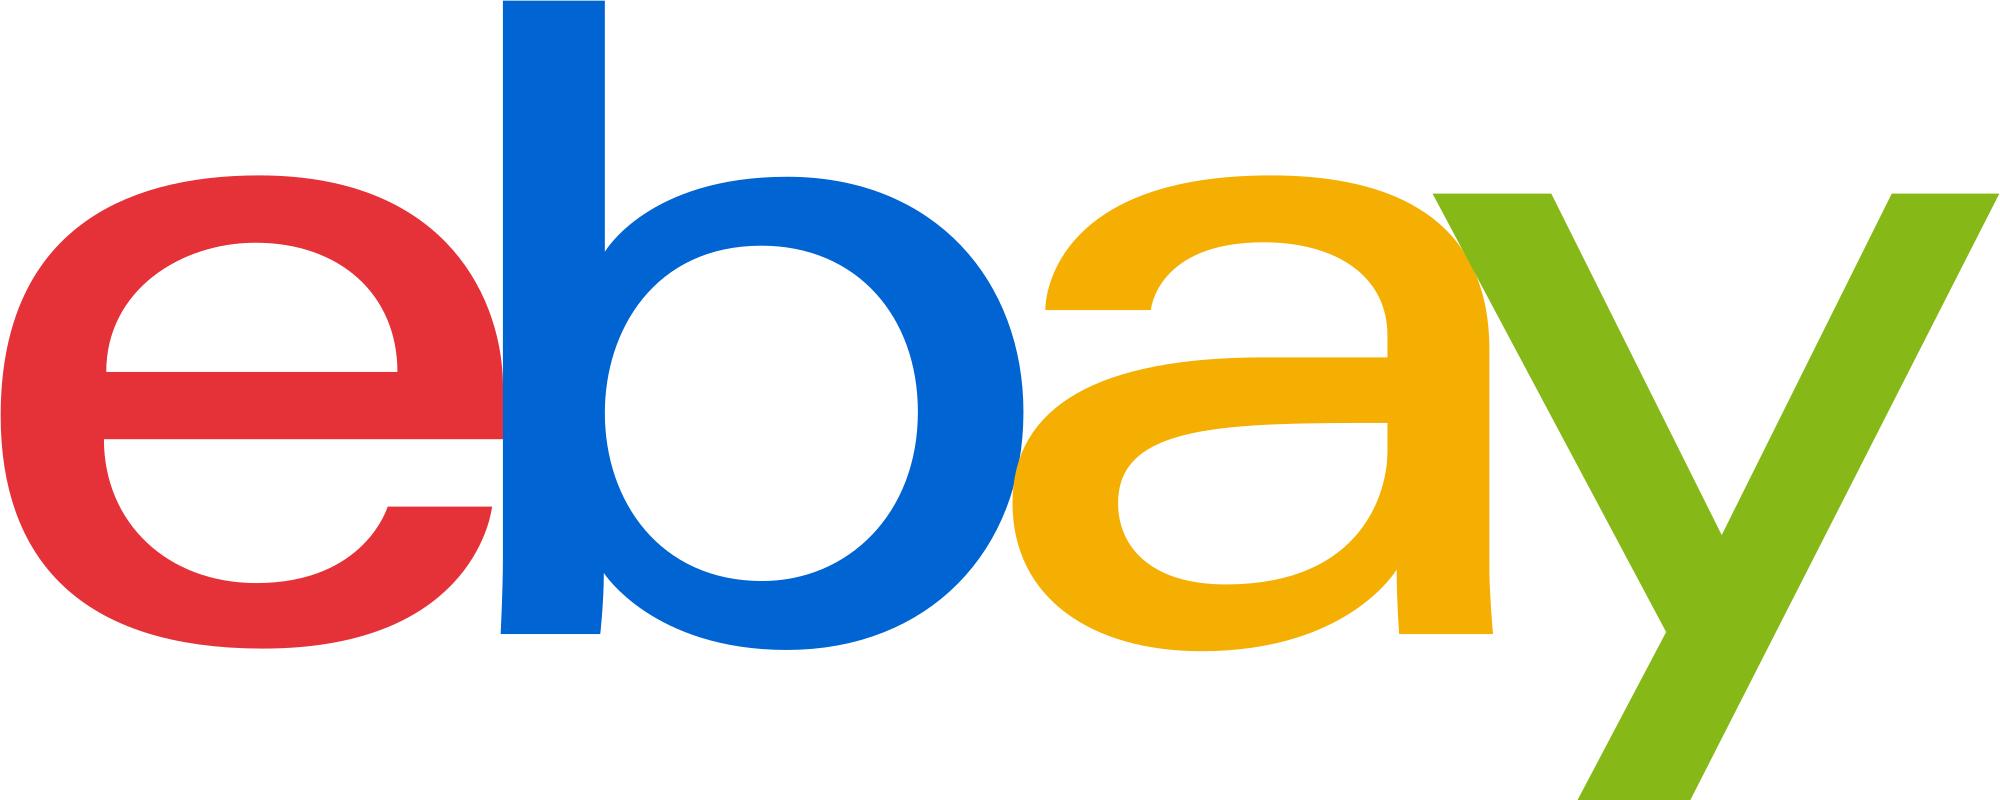 [Ebay USA] 15% Rabatt auf alles ab sofort bis 03:00 Uhr ( max. 87€ Rabatt)